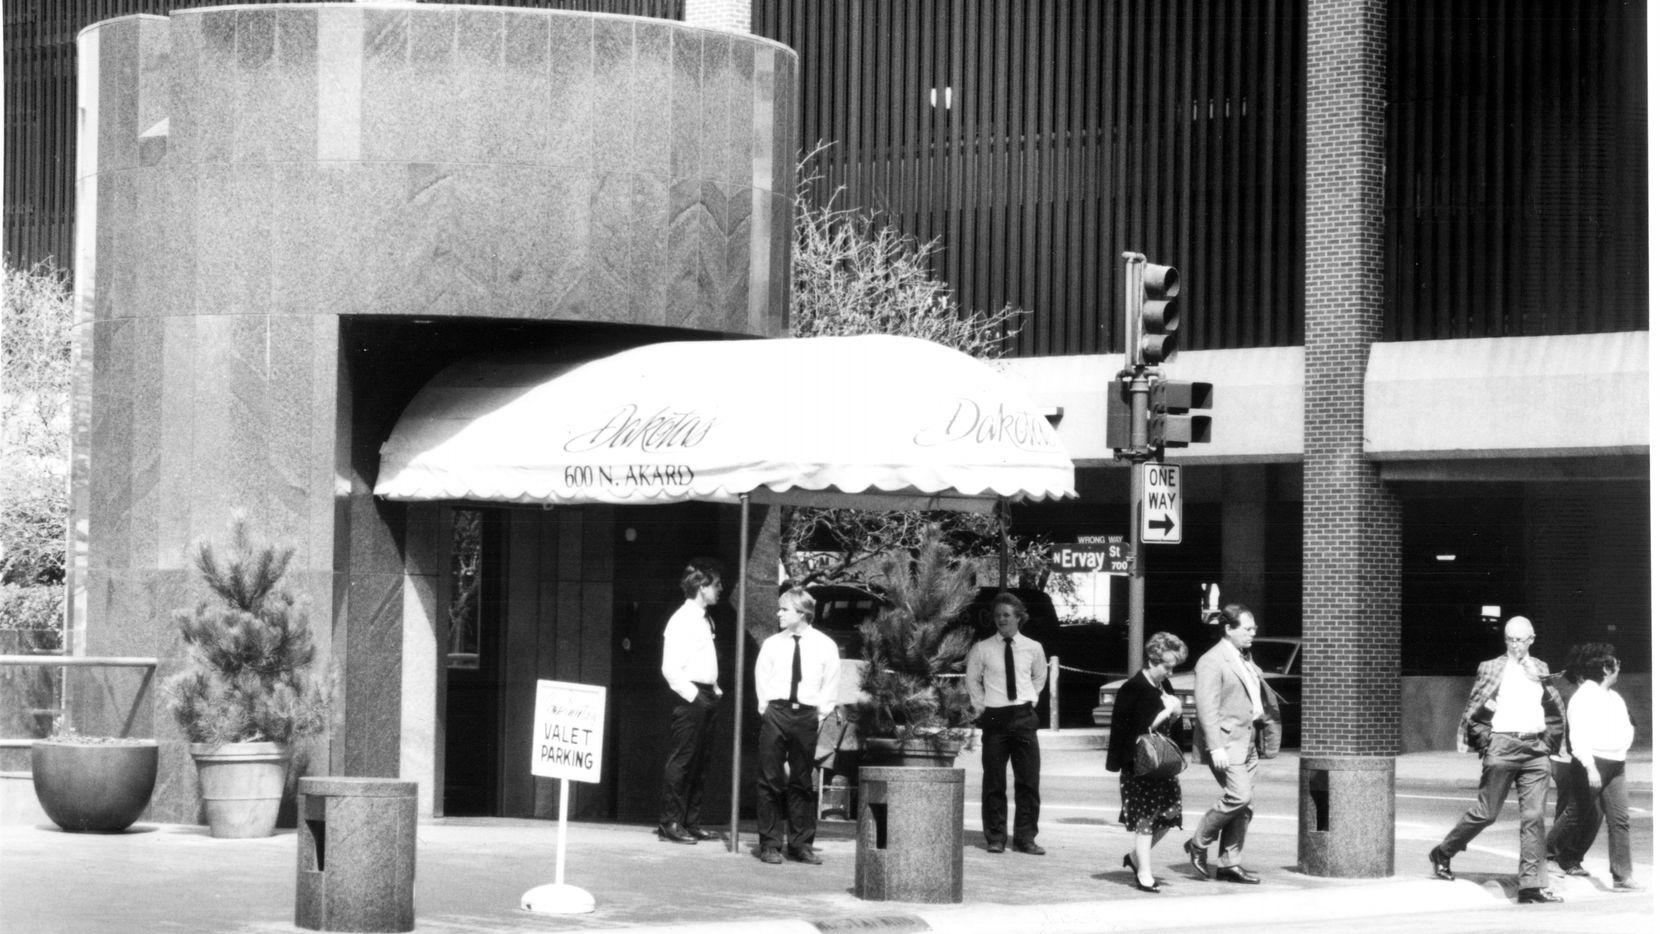 Image published in 03-12-1985 of Dakota's restaurant.